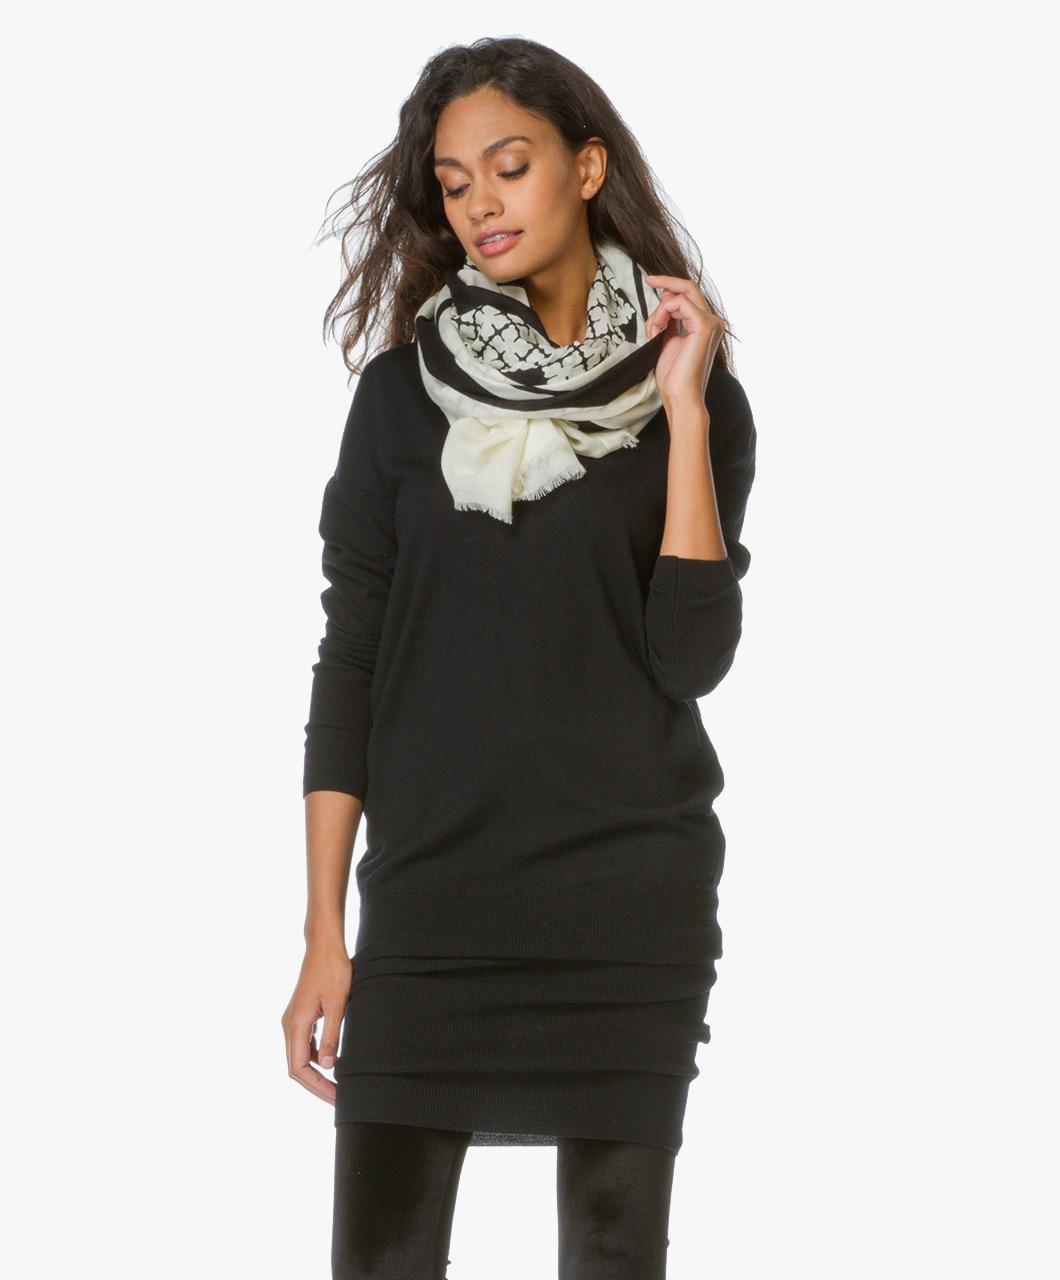 Malene Birger Axelremsväska : By malene birger printed woolen scarf deno ecru black